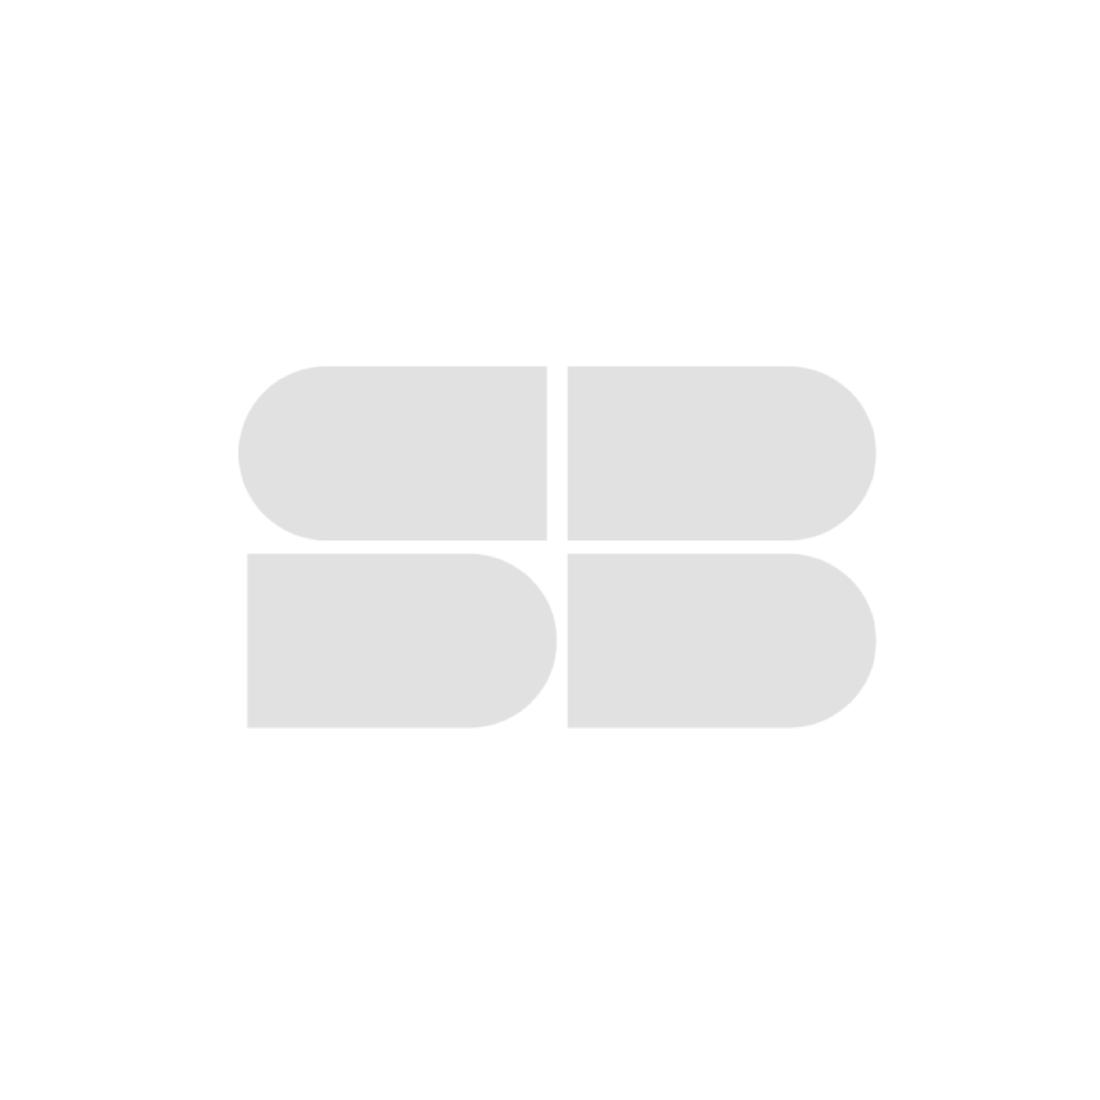 SANTAS หมอนหนุน รุ่น DACRON® COMFOREL® DOWN ESSENCE™ -SANTAS